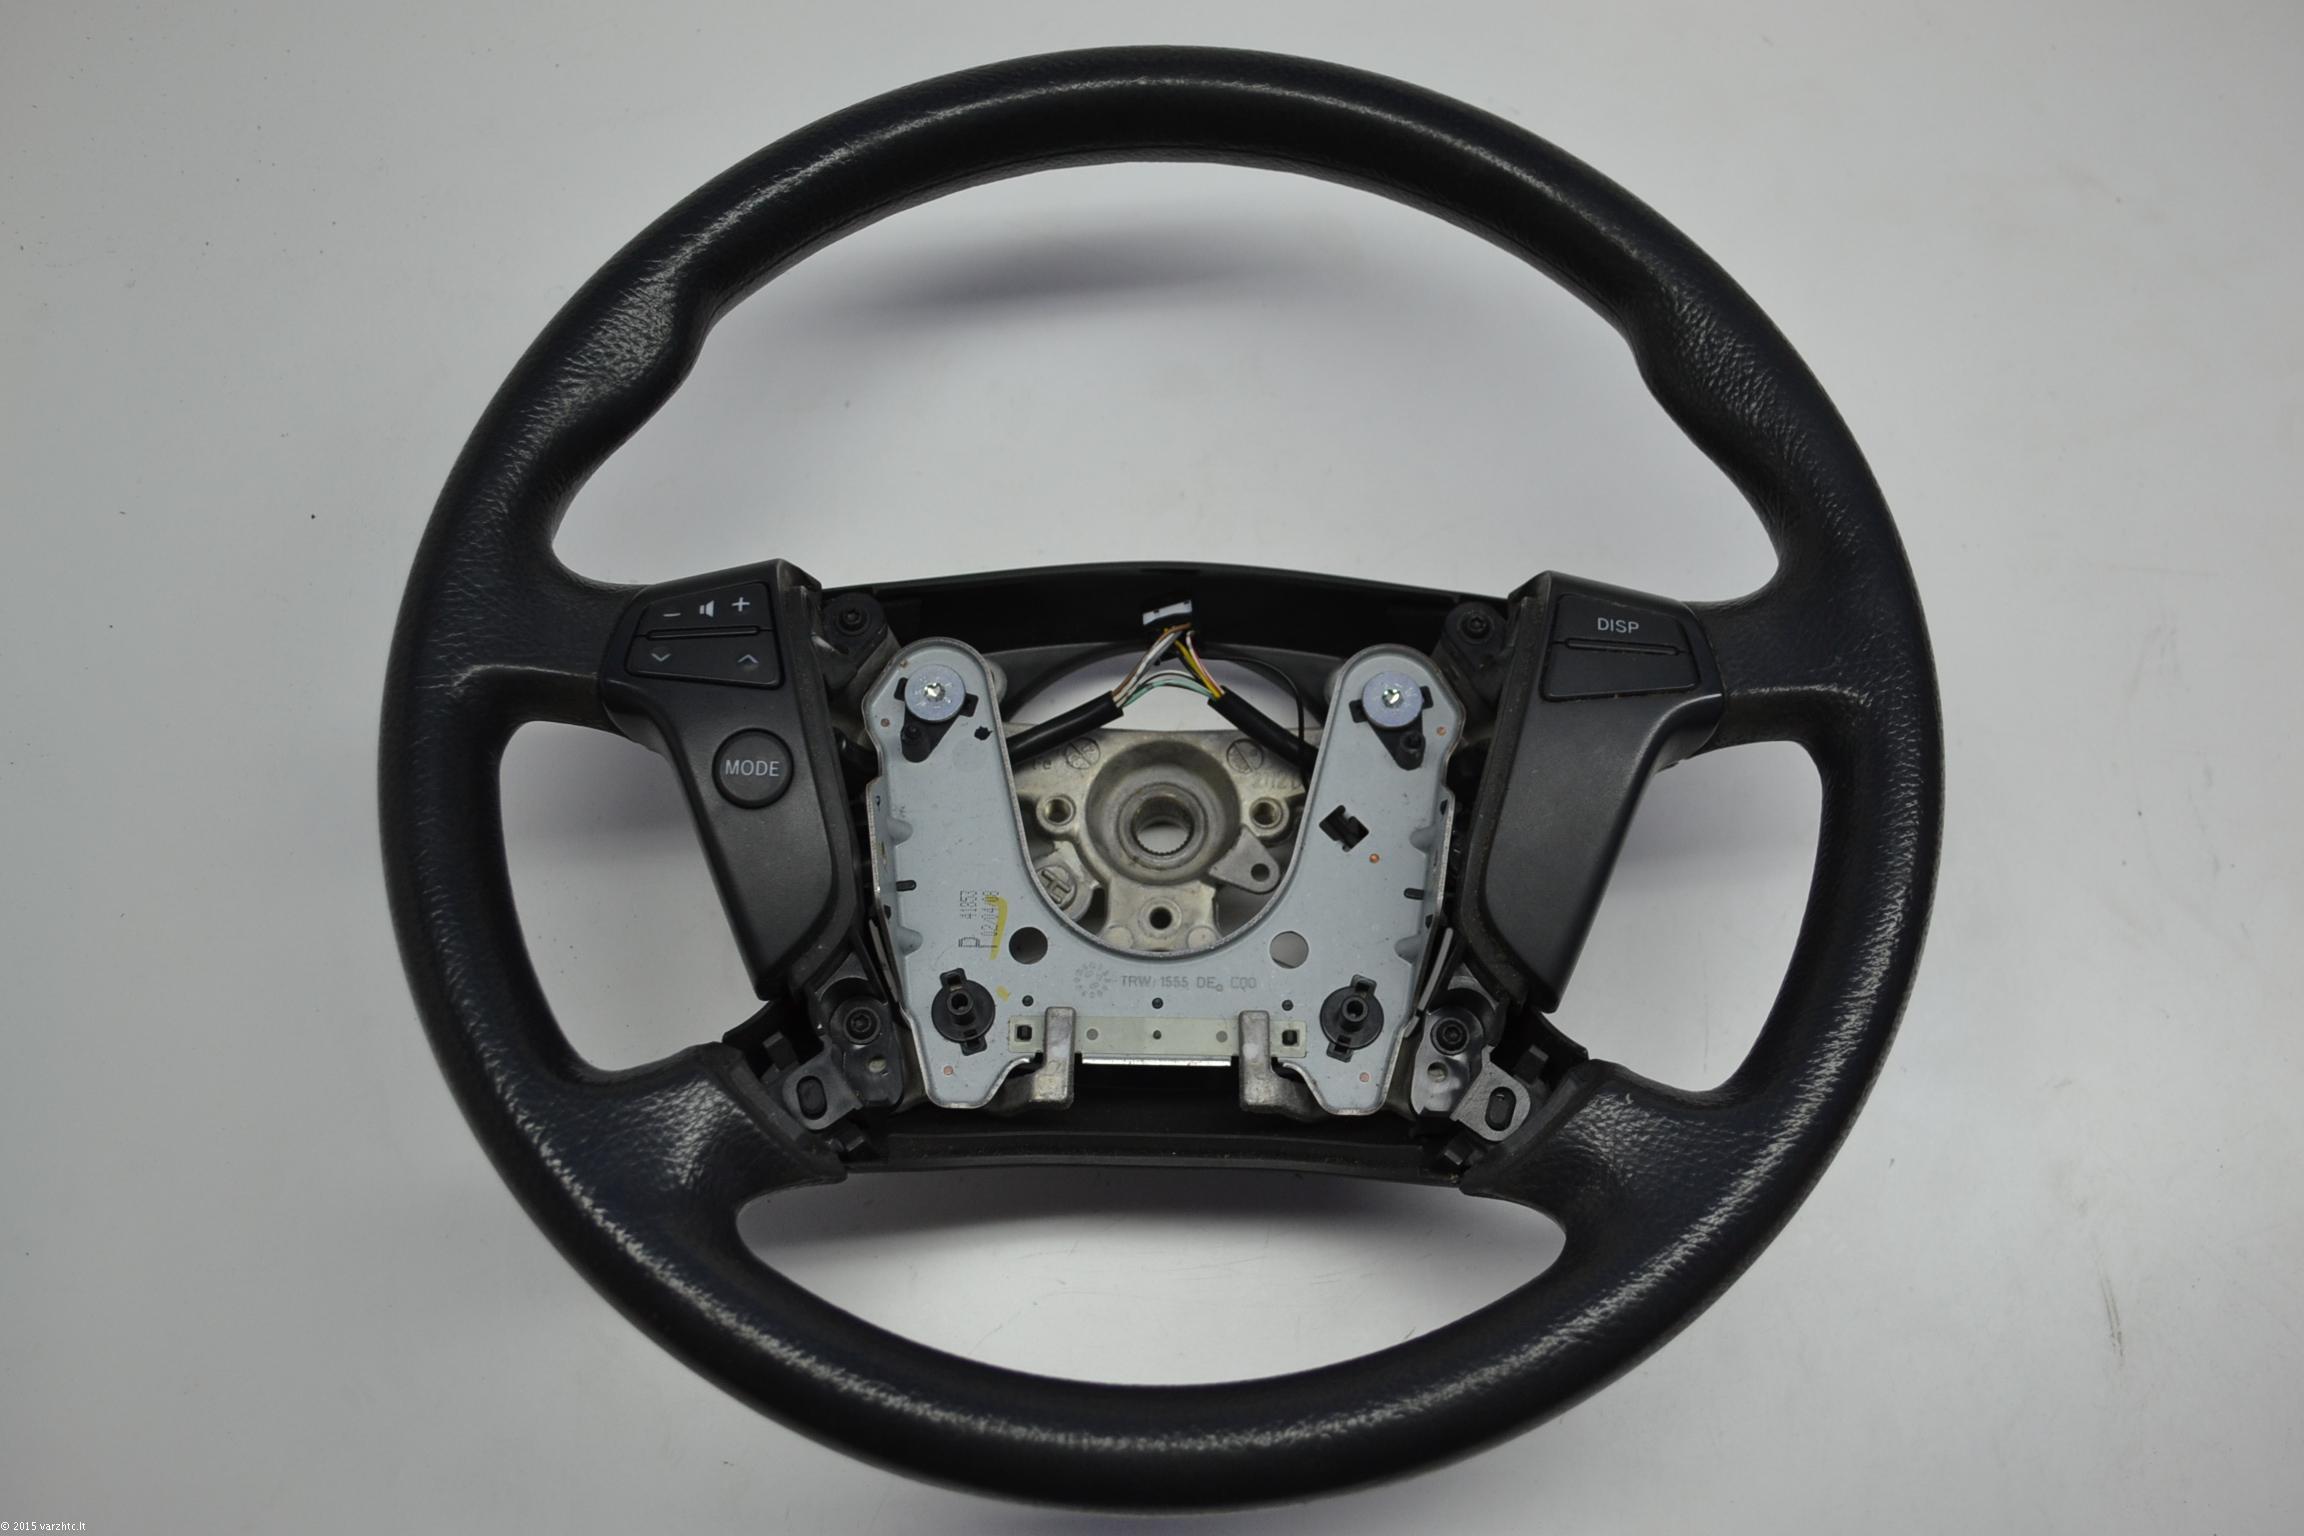 toyota avensis 2006 steering wheel multi function trw1555de rhd. Black Bedroom Furniture Sets. Home Design Ideas